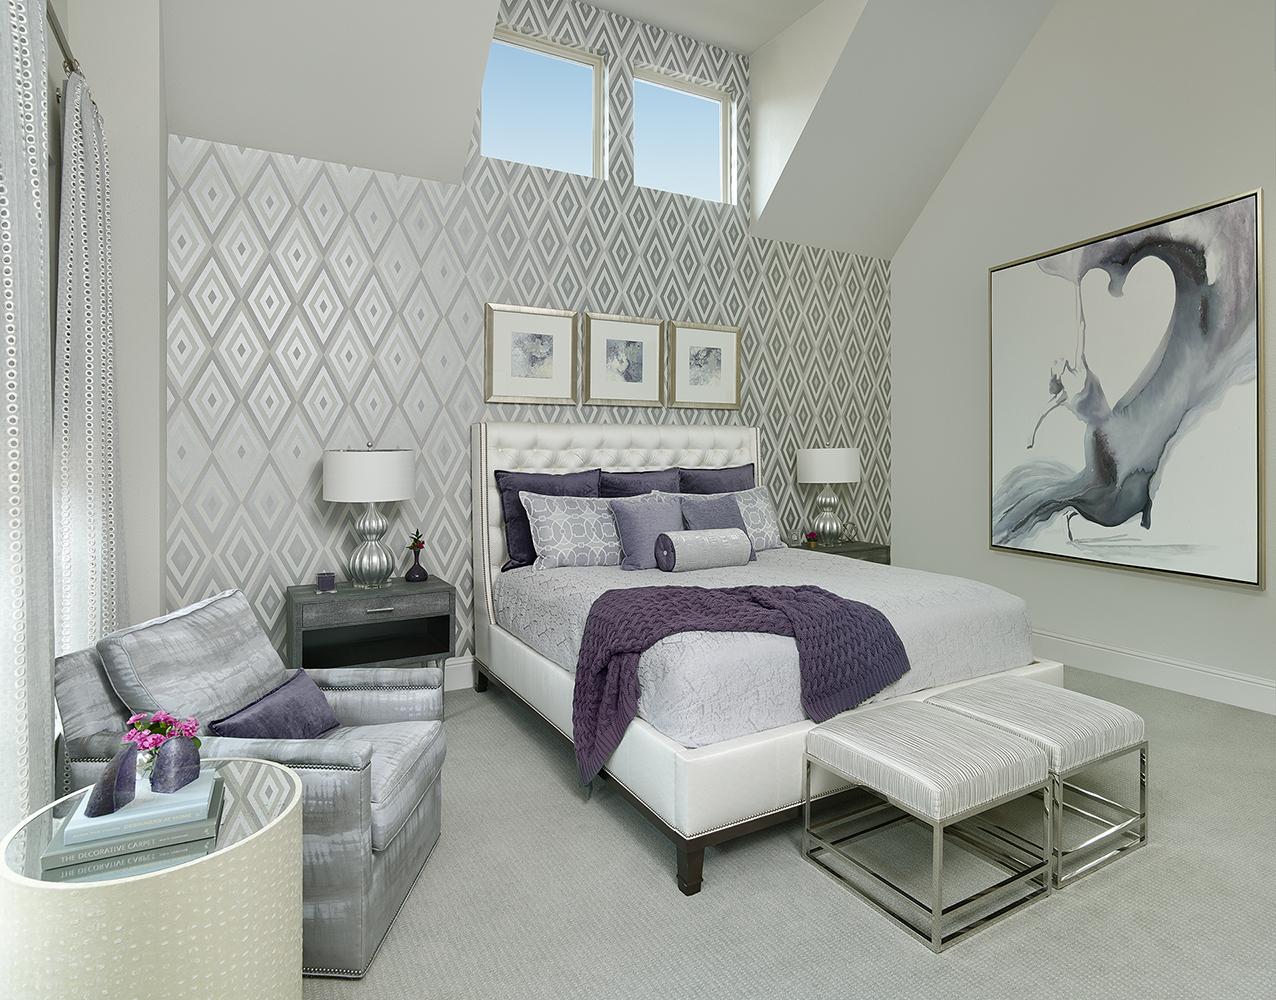 Bedroom Design Ideas: The Power of Purple | Barbara Gilbert Interiors | Interior Design Dallas